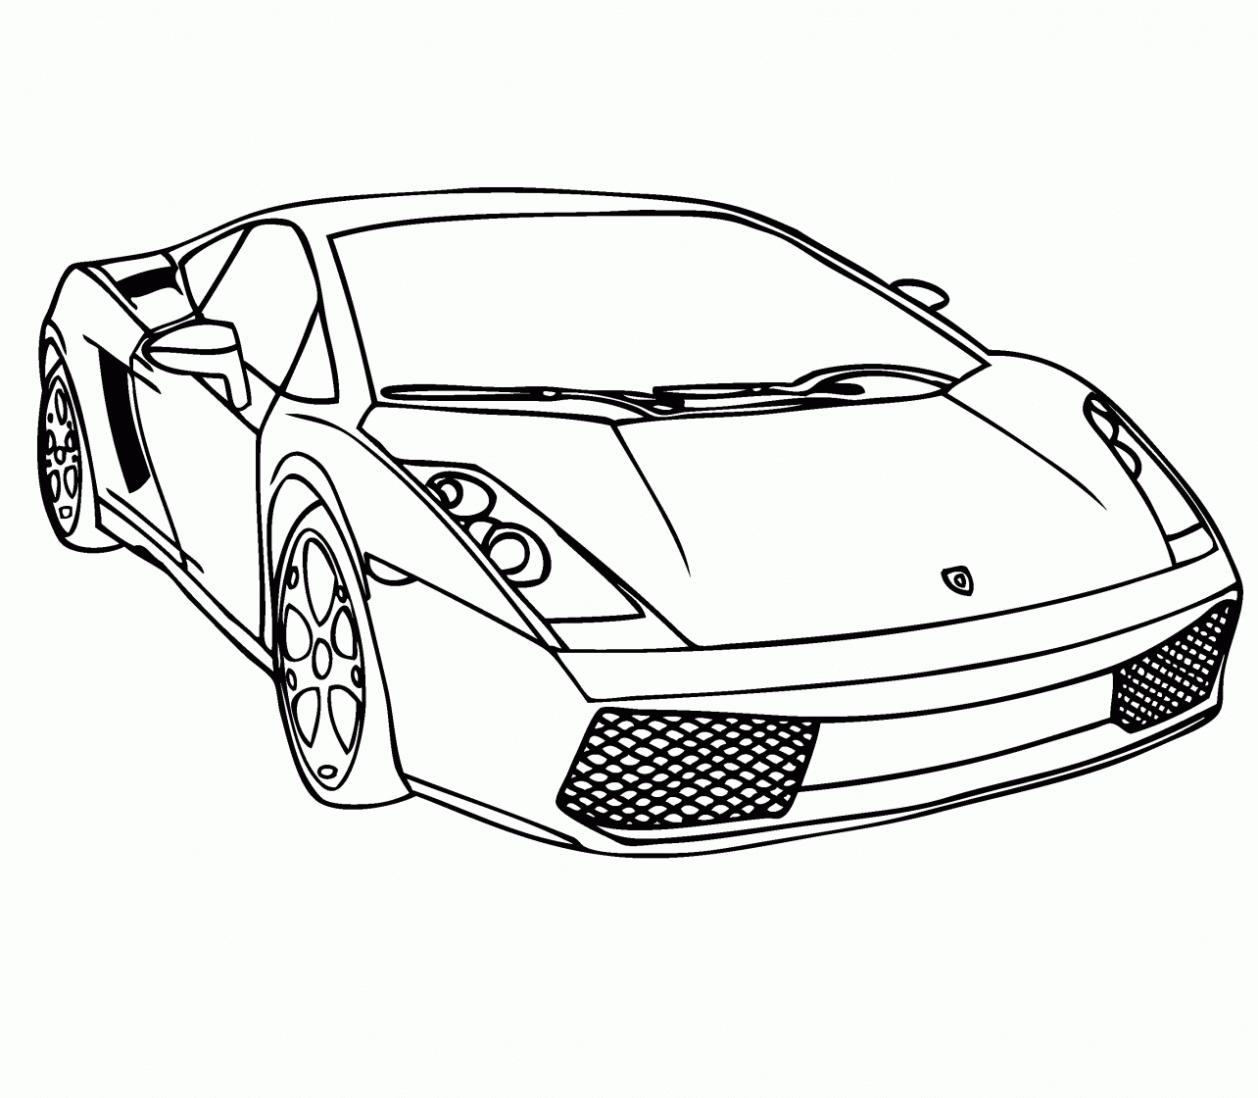 Rennauto Lamborghini Malvorlagen Fur Kinder Malvorlage Auto Cars Ausmalbilder Ausmalbilder Zum Ausdrucken